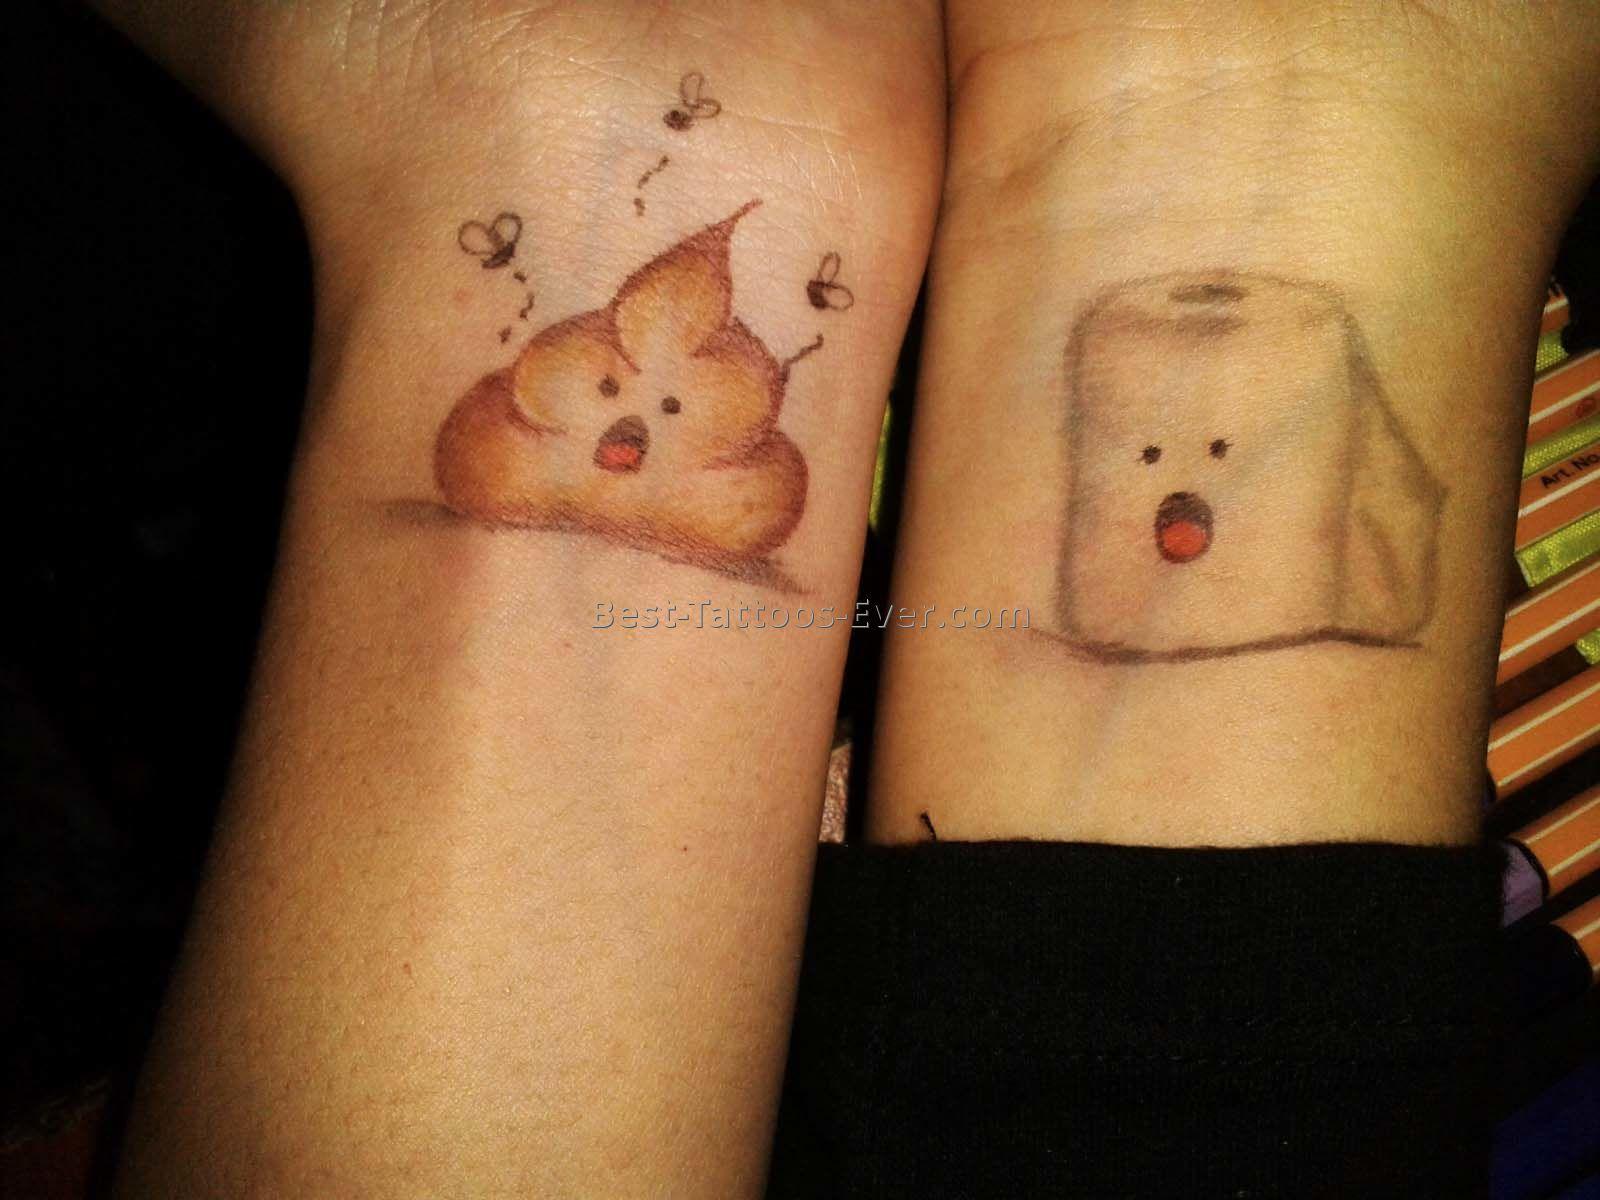 matching-friendship-tattoo-0 Тату на животе для девушек: топ-5 идей для эскизов, фото татуировок